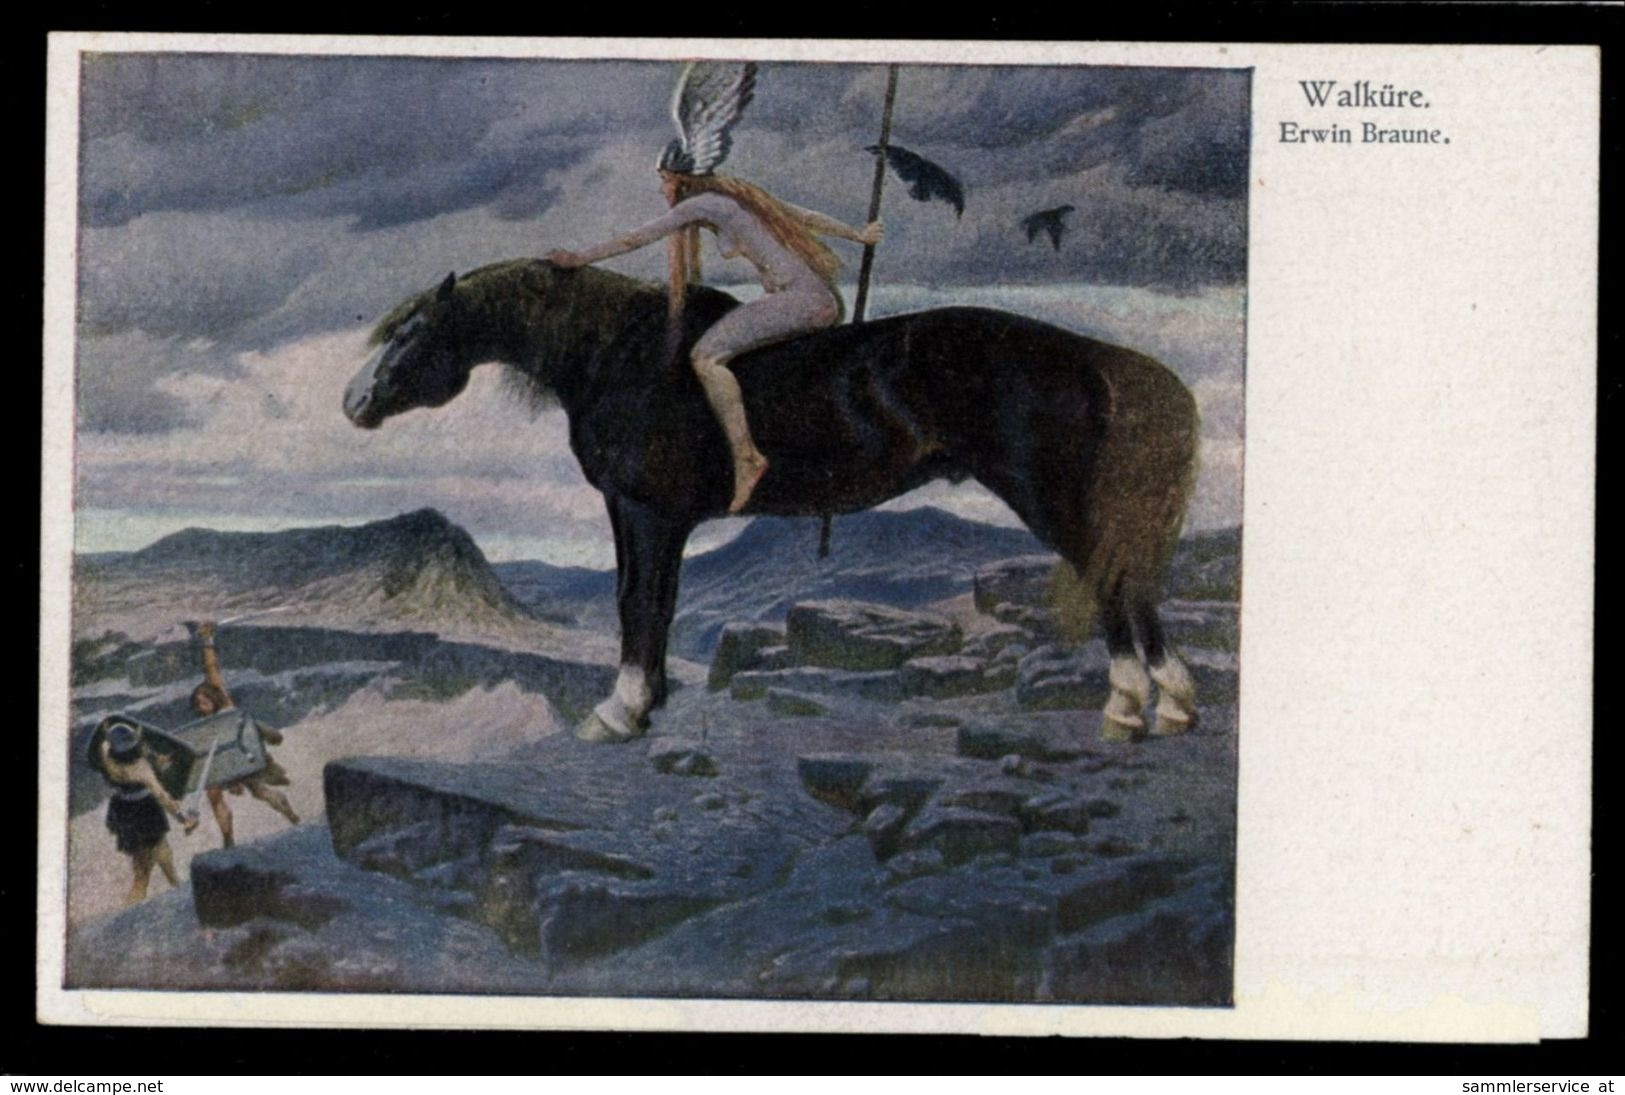 [015] Pferde-Karte 238, Walküre Mit Pferd, Künstlerkarte Erwin Braune, ~1910, Amag - Pferde